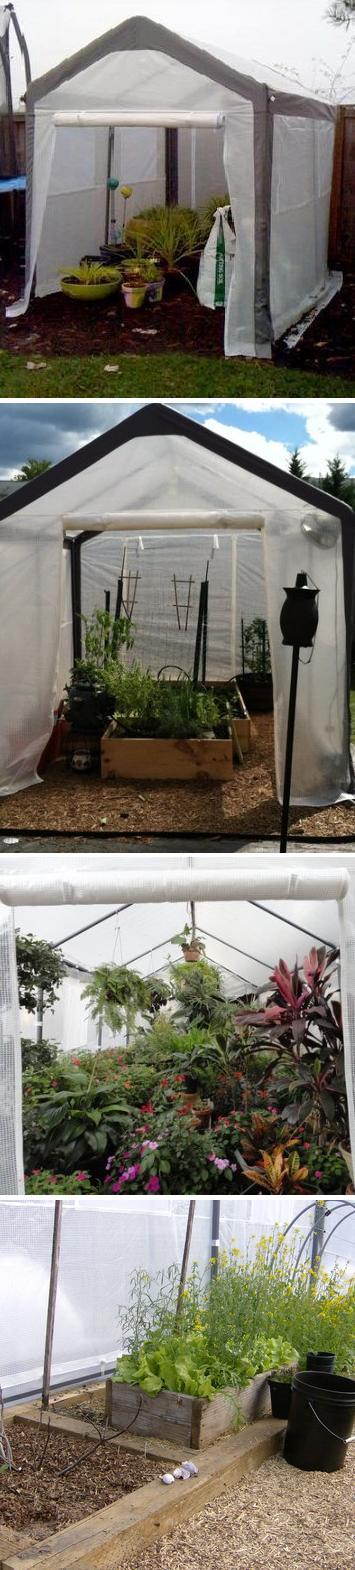 Spring Gardener Gable Portable Greenhouse